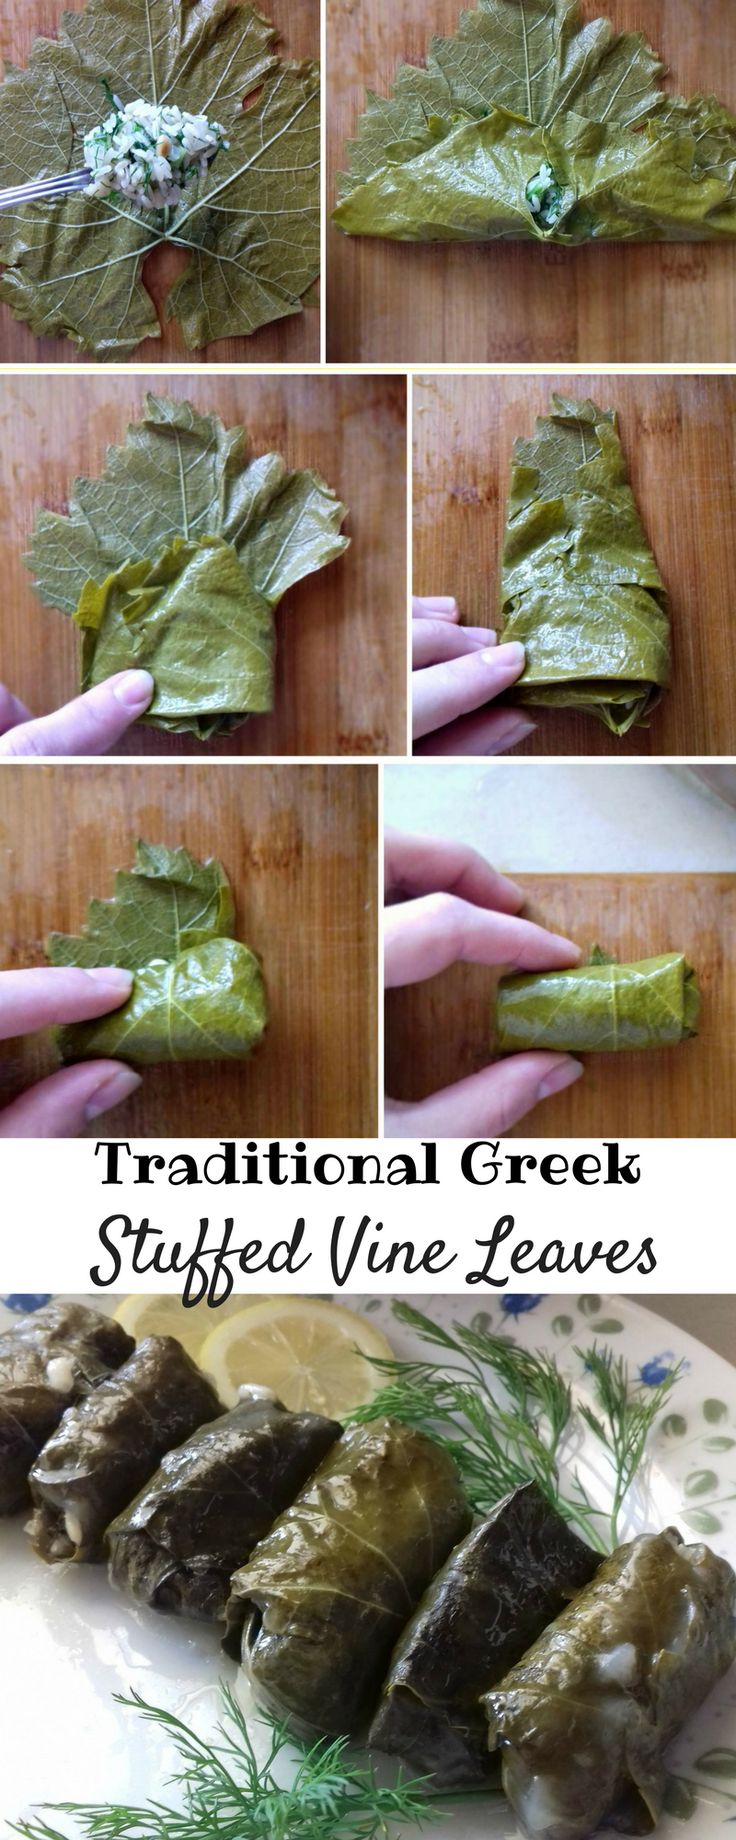 Traditional Greek Stuffed Vine Leaves is a unique and very healthy dish. #vineleaves #ricefilling #pinenuts #lemonjuice #recipe #freshherbs #vegeterian #vegan